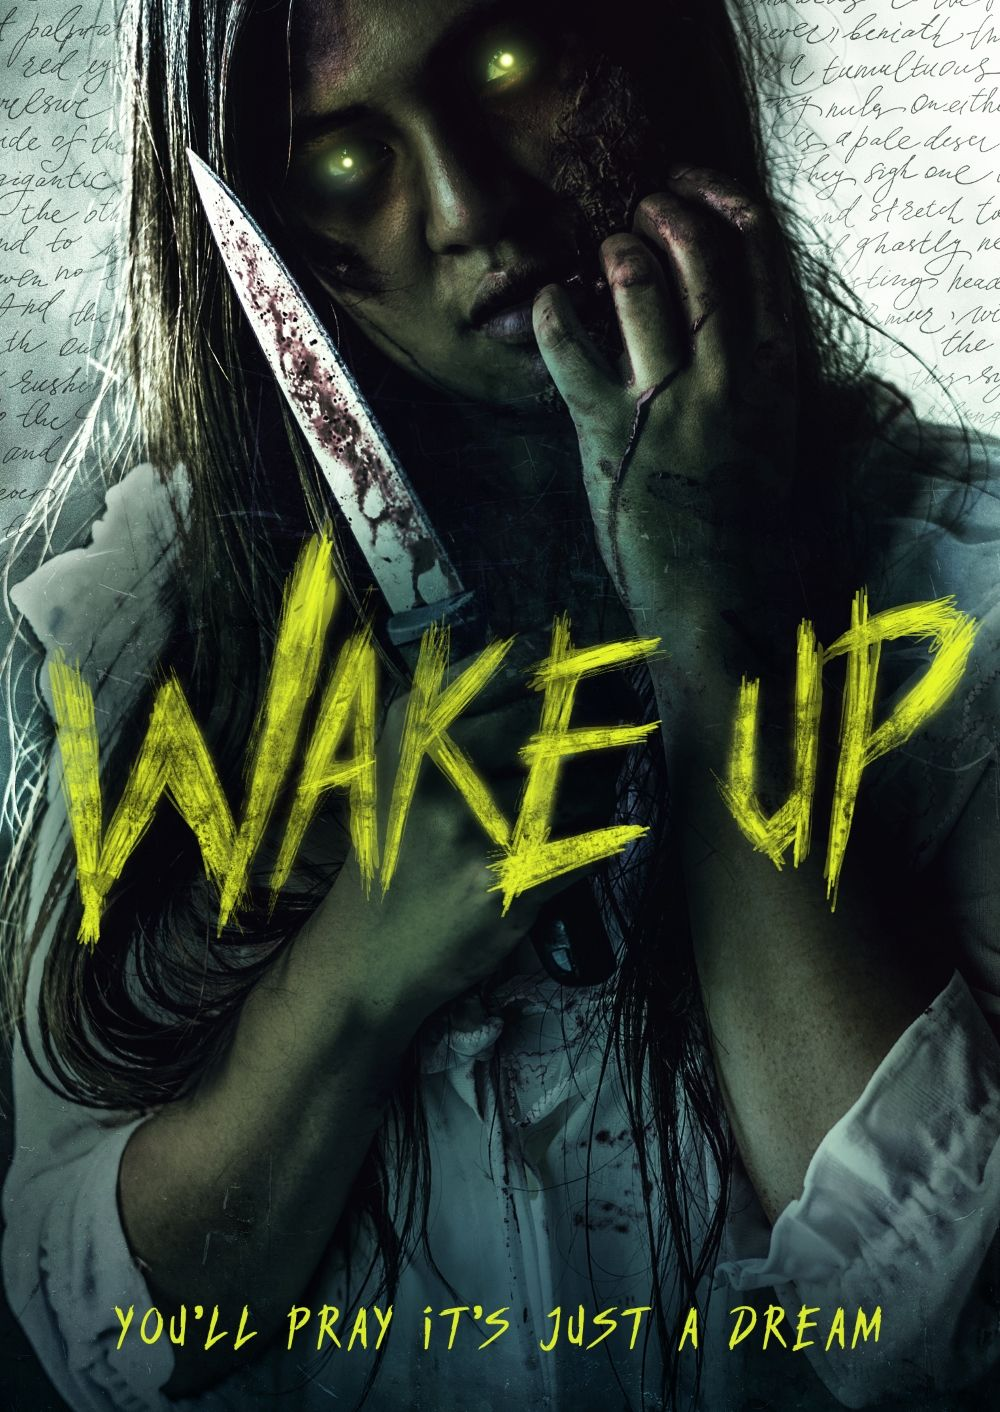 Wake Up movie trailer